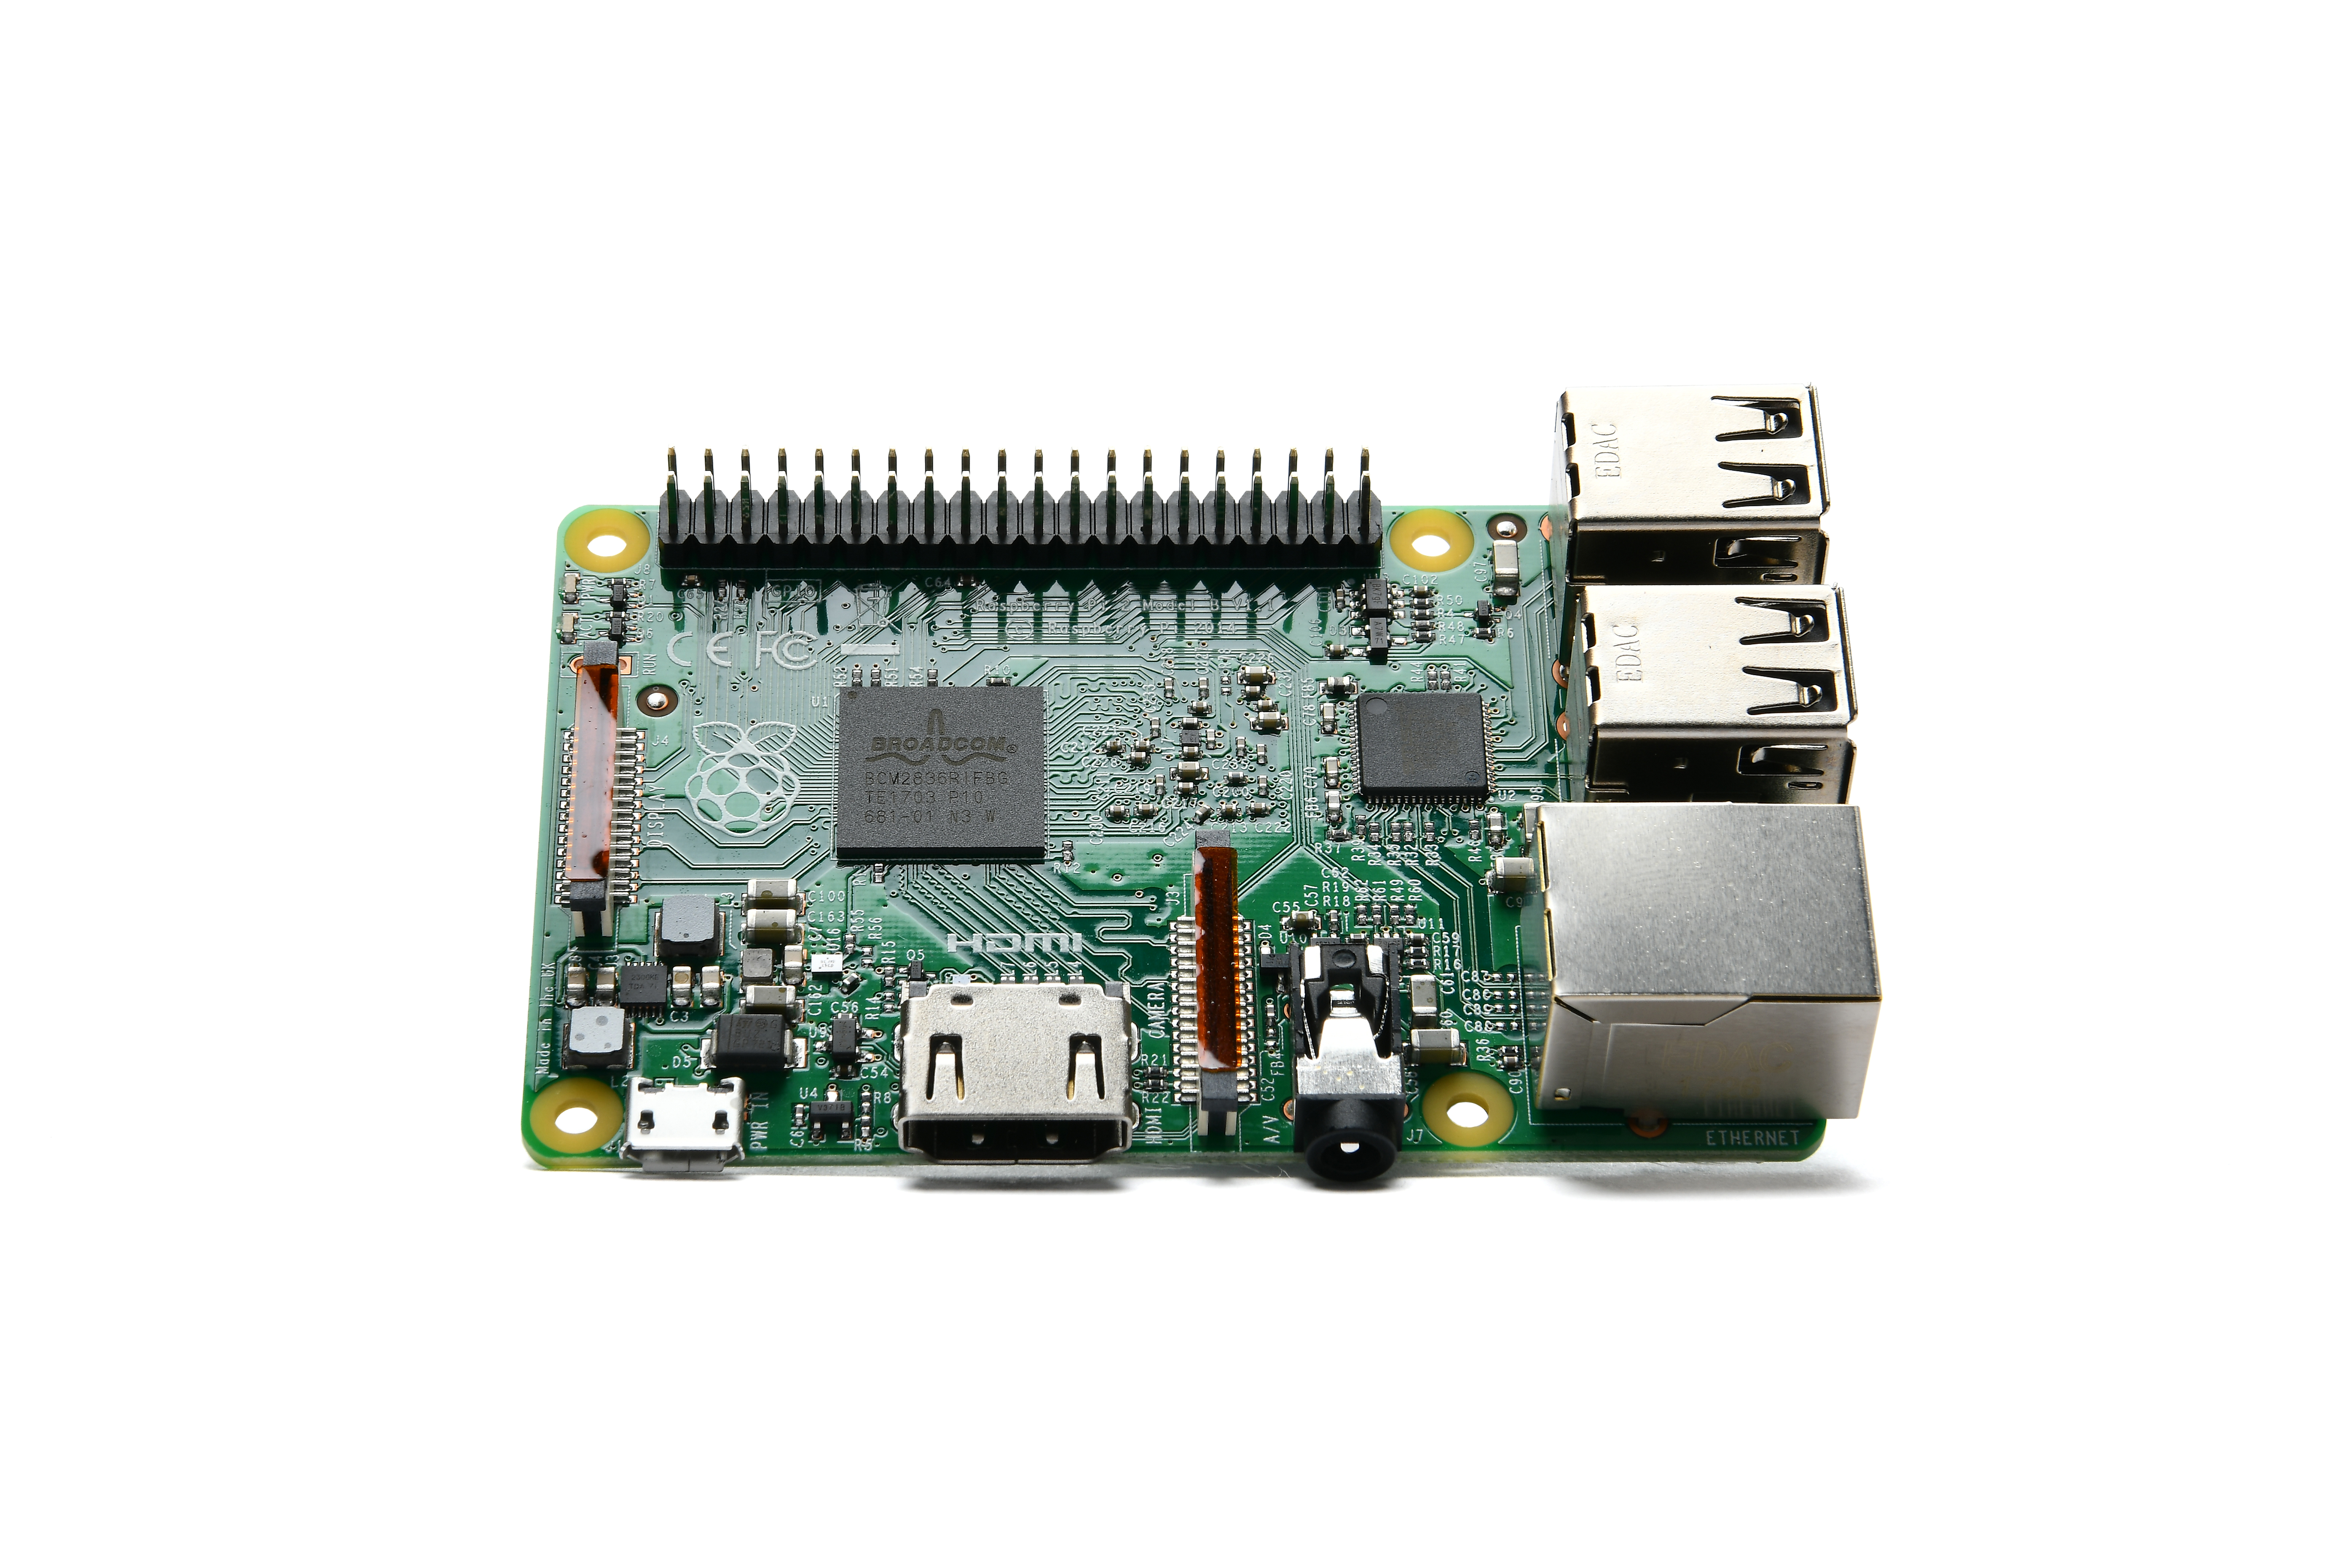 RaspberryPi 2 Model B